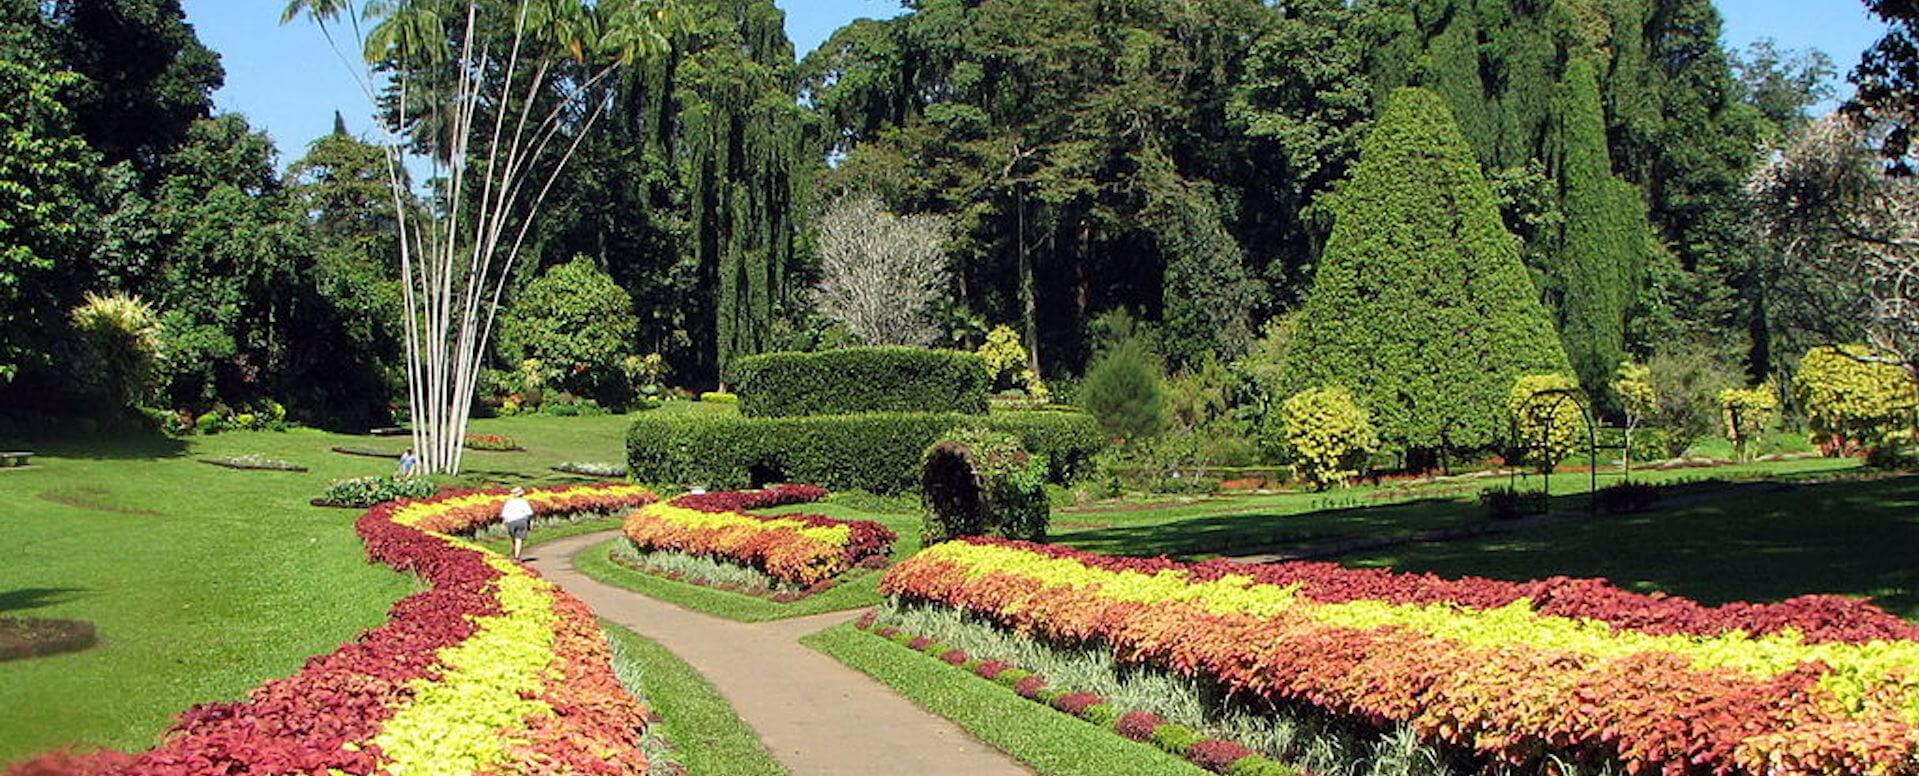 Le jardin botanique de Kandy - Sri Lanka